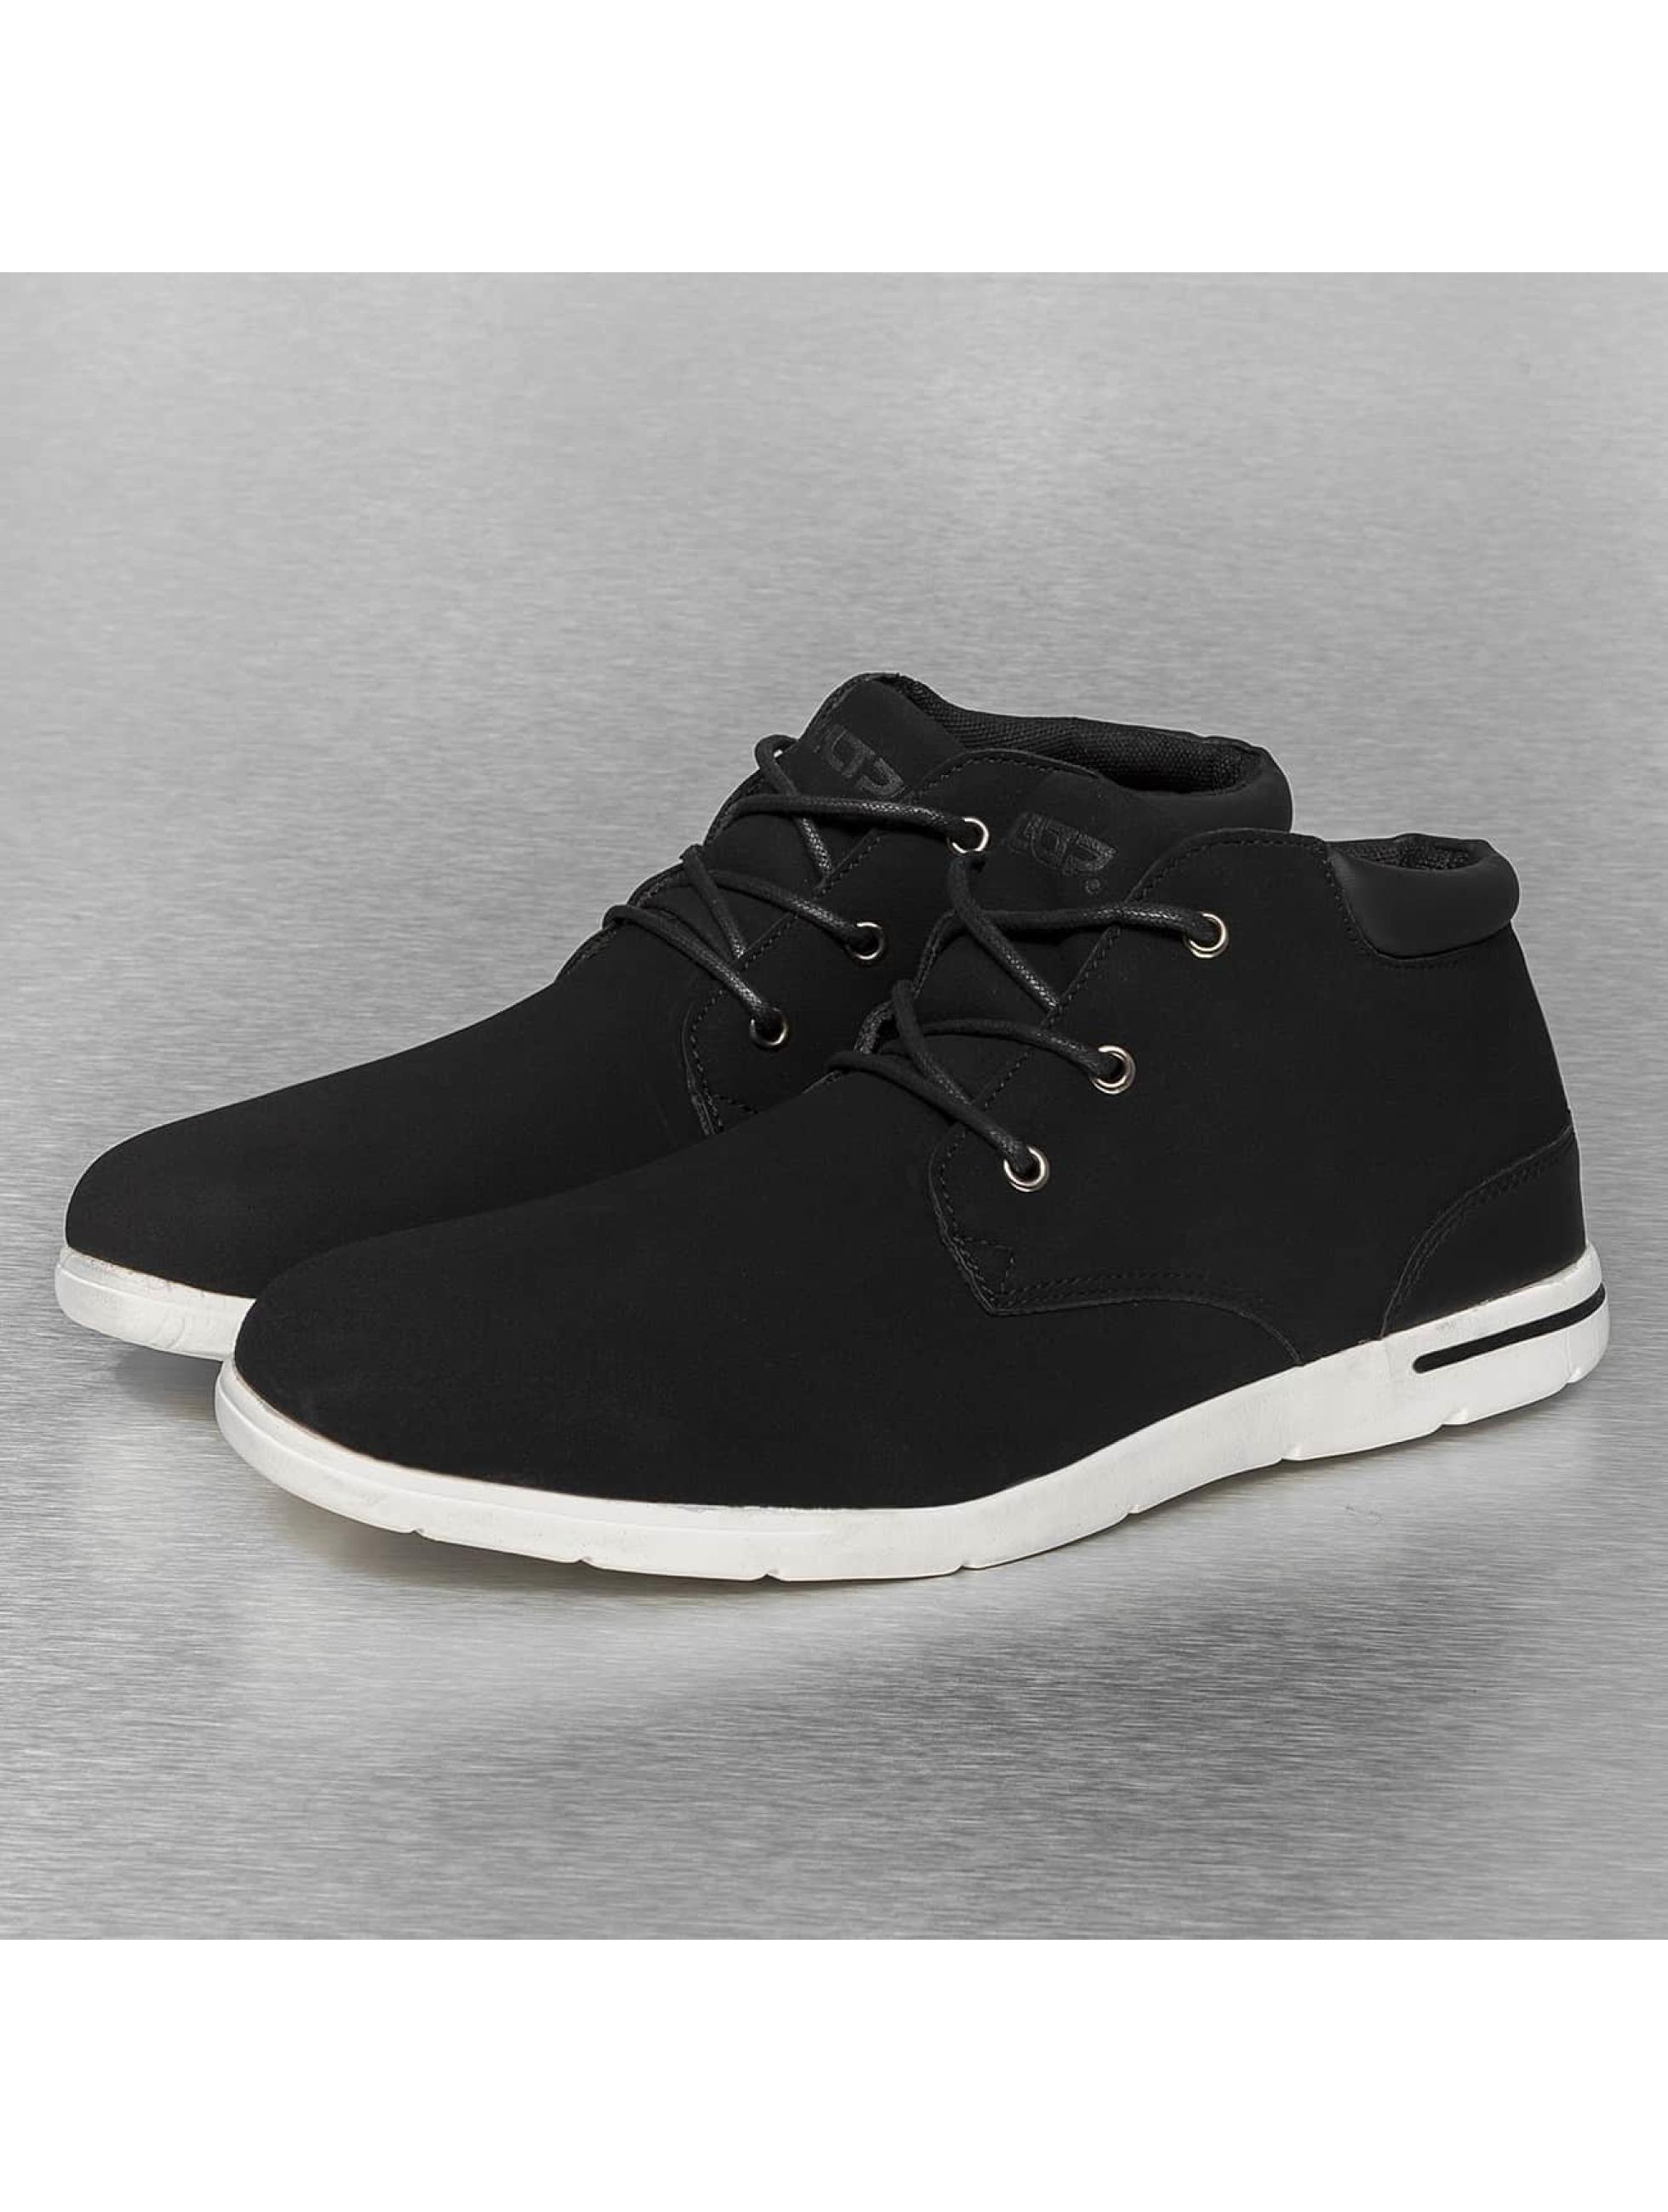 New York Style Sneakers Gero black